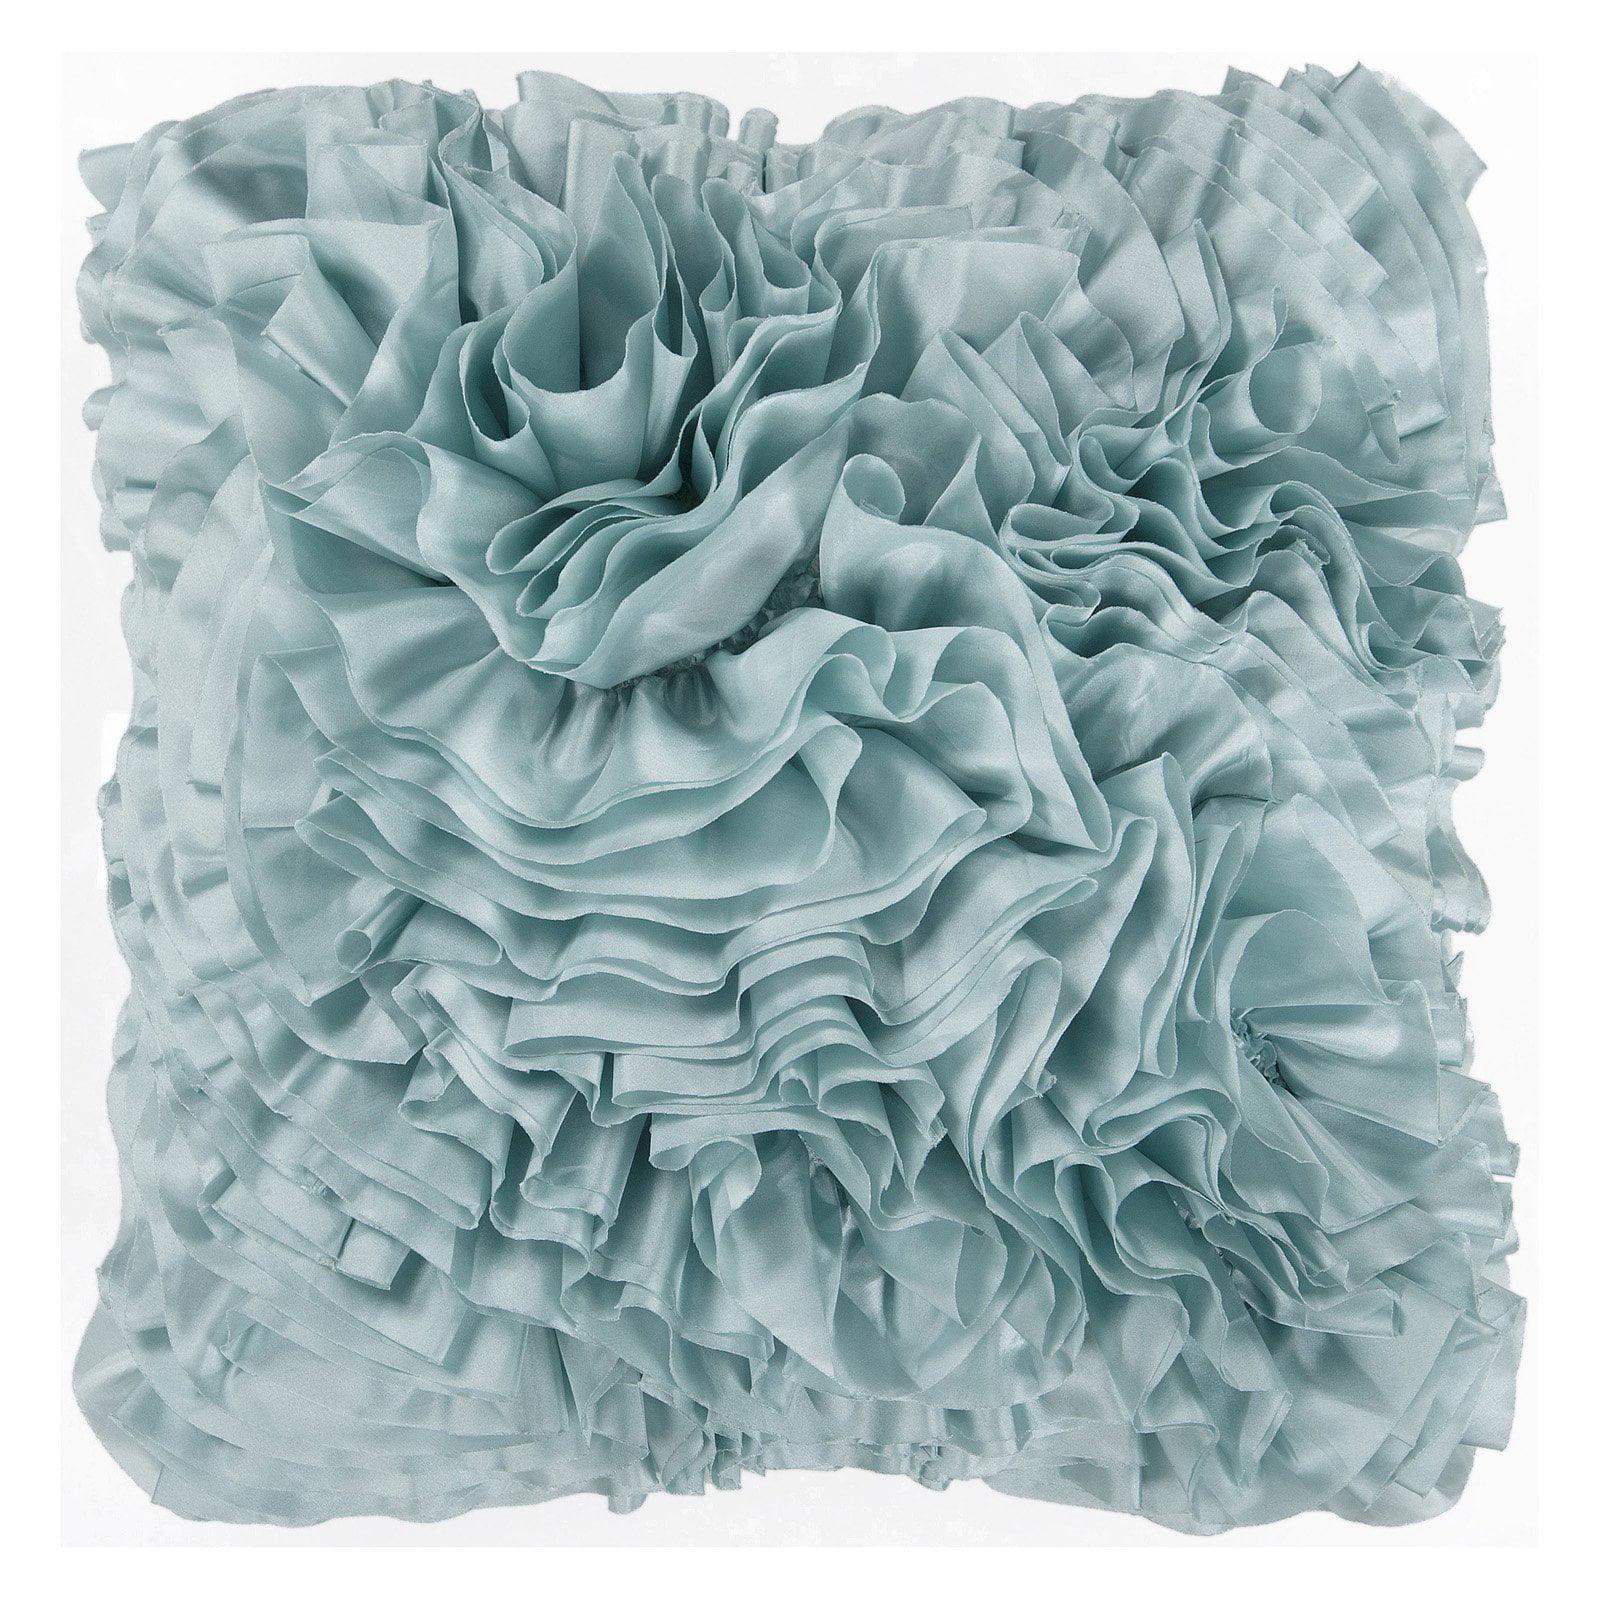 Surya Ruffles Decorative Pillow - Light Blue